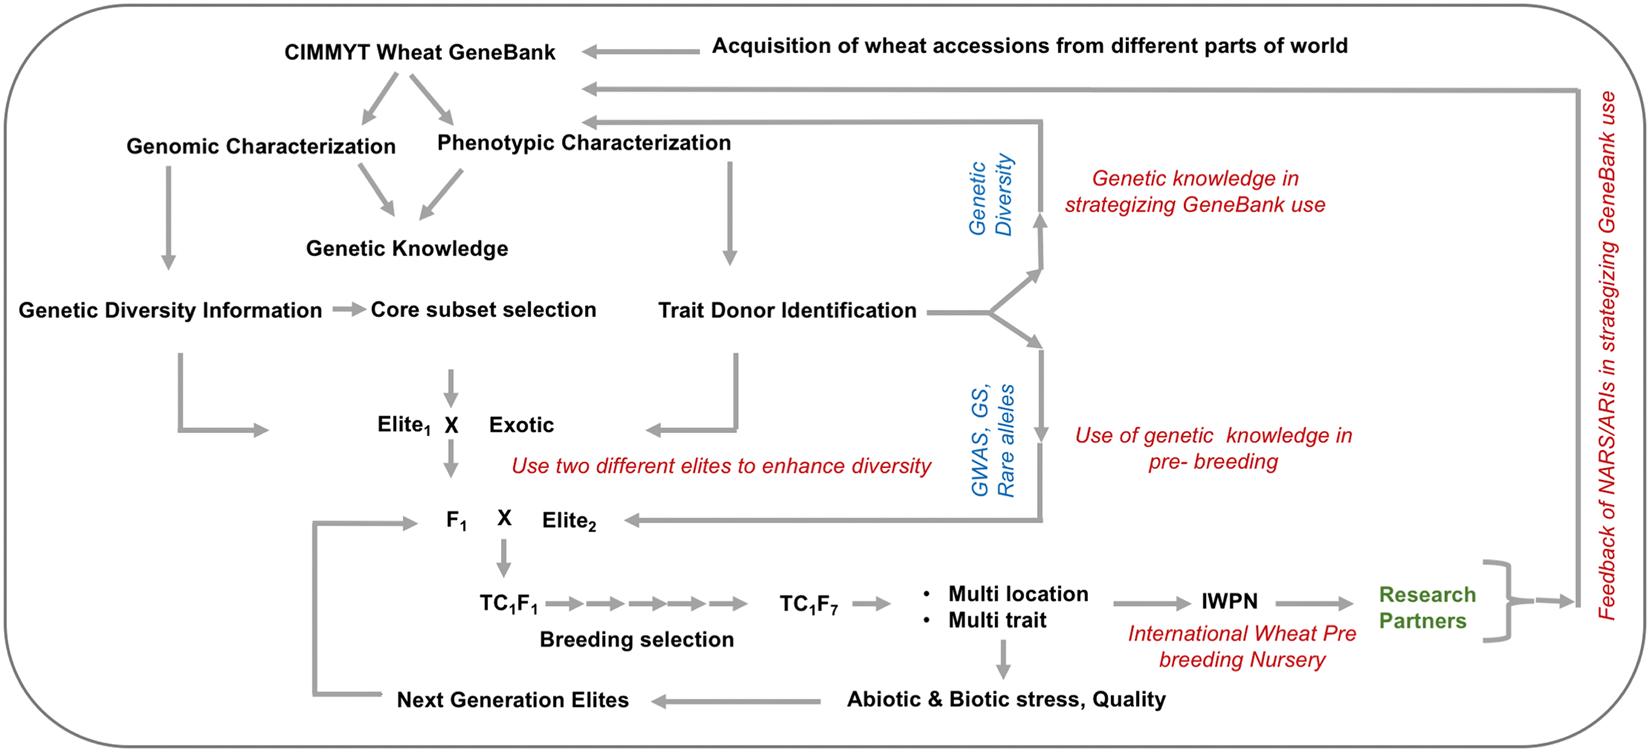 Harnessing genetic potential of wheat germplasm banks through impact